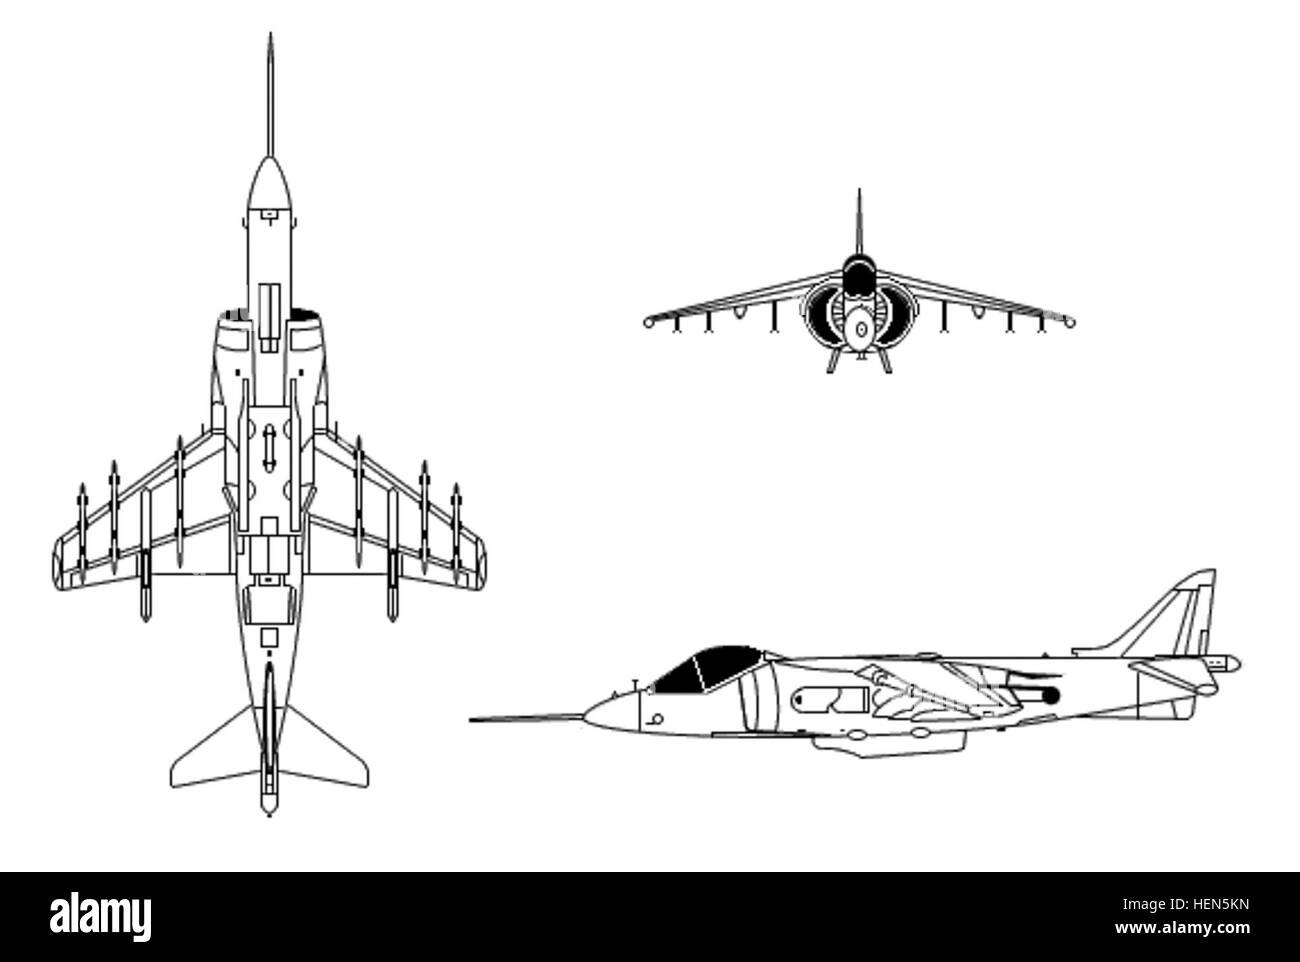 Harrier Ii Black And White Stock Photos Images Alamy Engine Diagram Mcdonnell Douglas Bae Av 8b Image